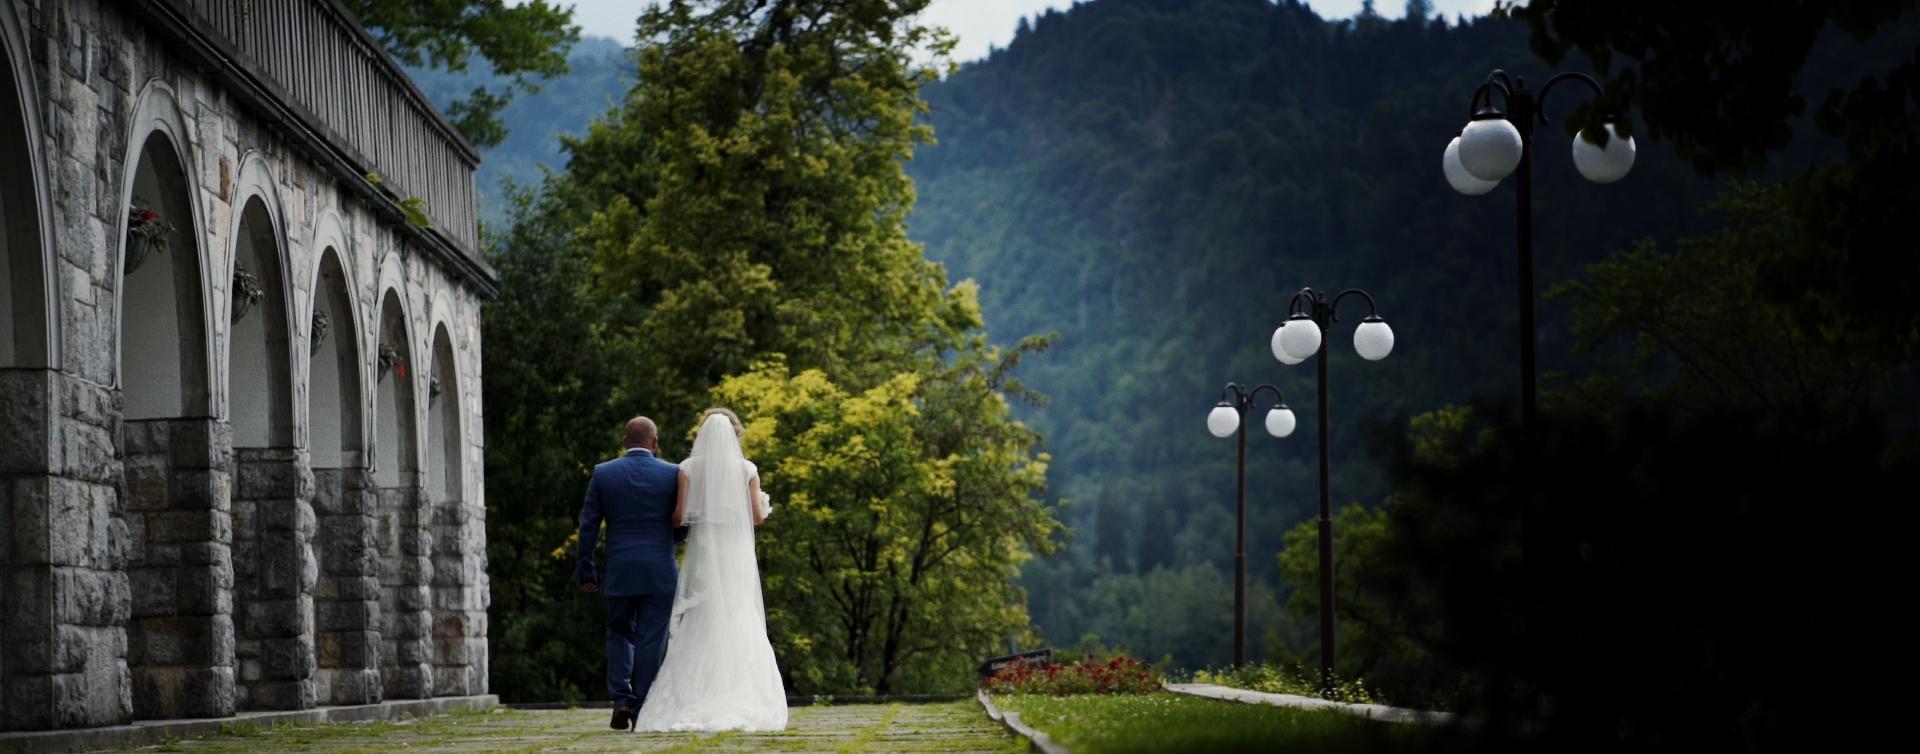 Vila Bled Terrace Wedding Photography